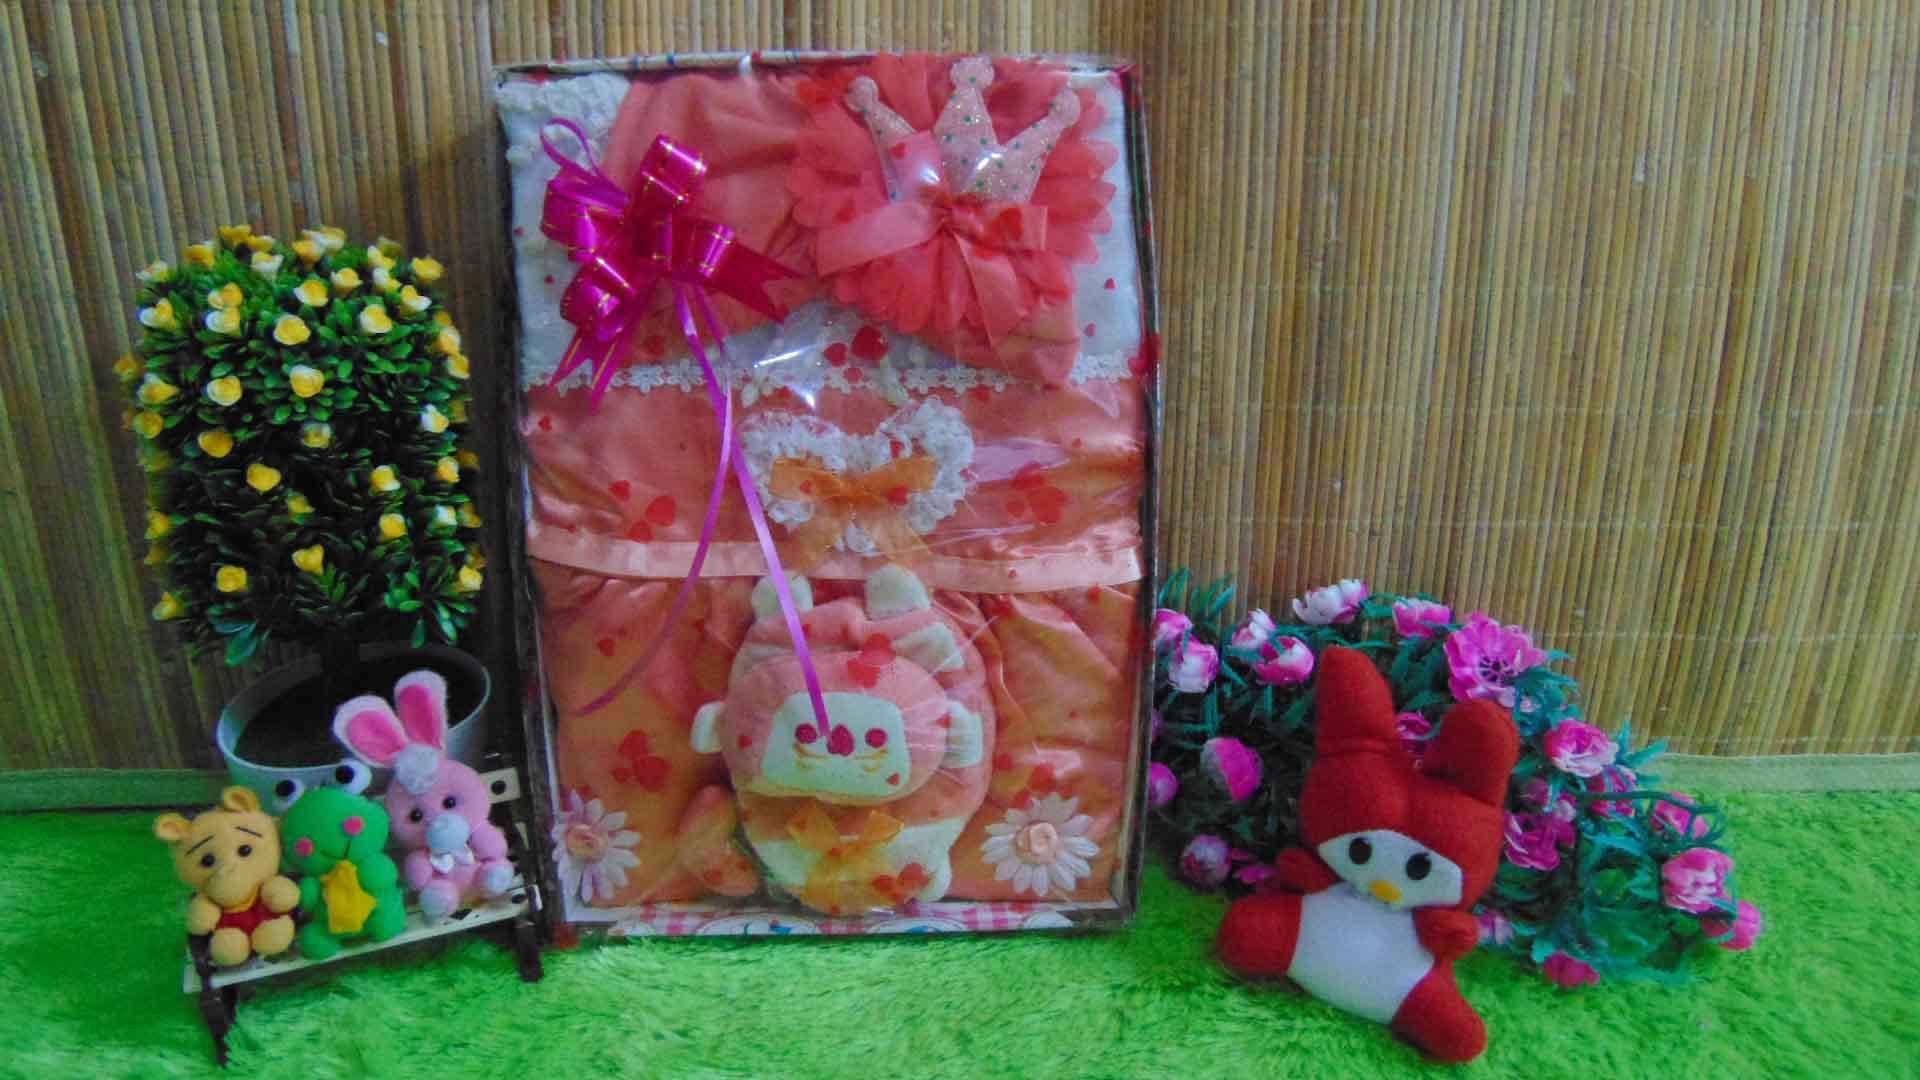 paket kado bayi peach cantik 65 terdiri dari dress bayi cantik,turban bayi cantik,dan tas bayi mini imut,cocok banget utk kado